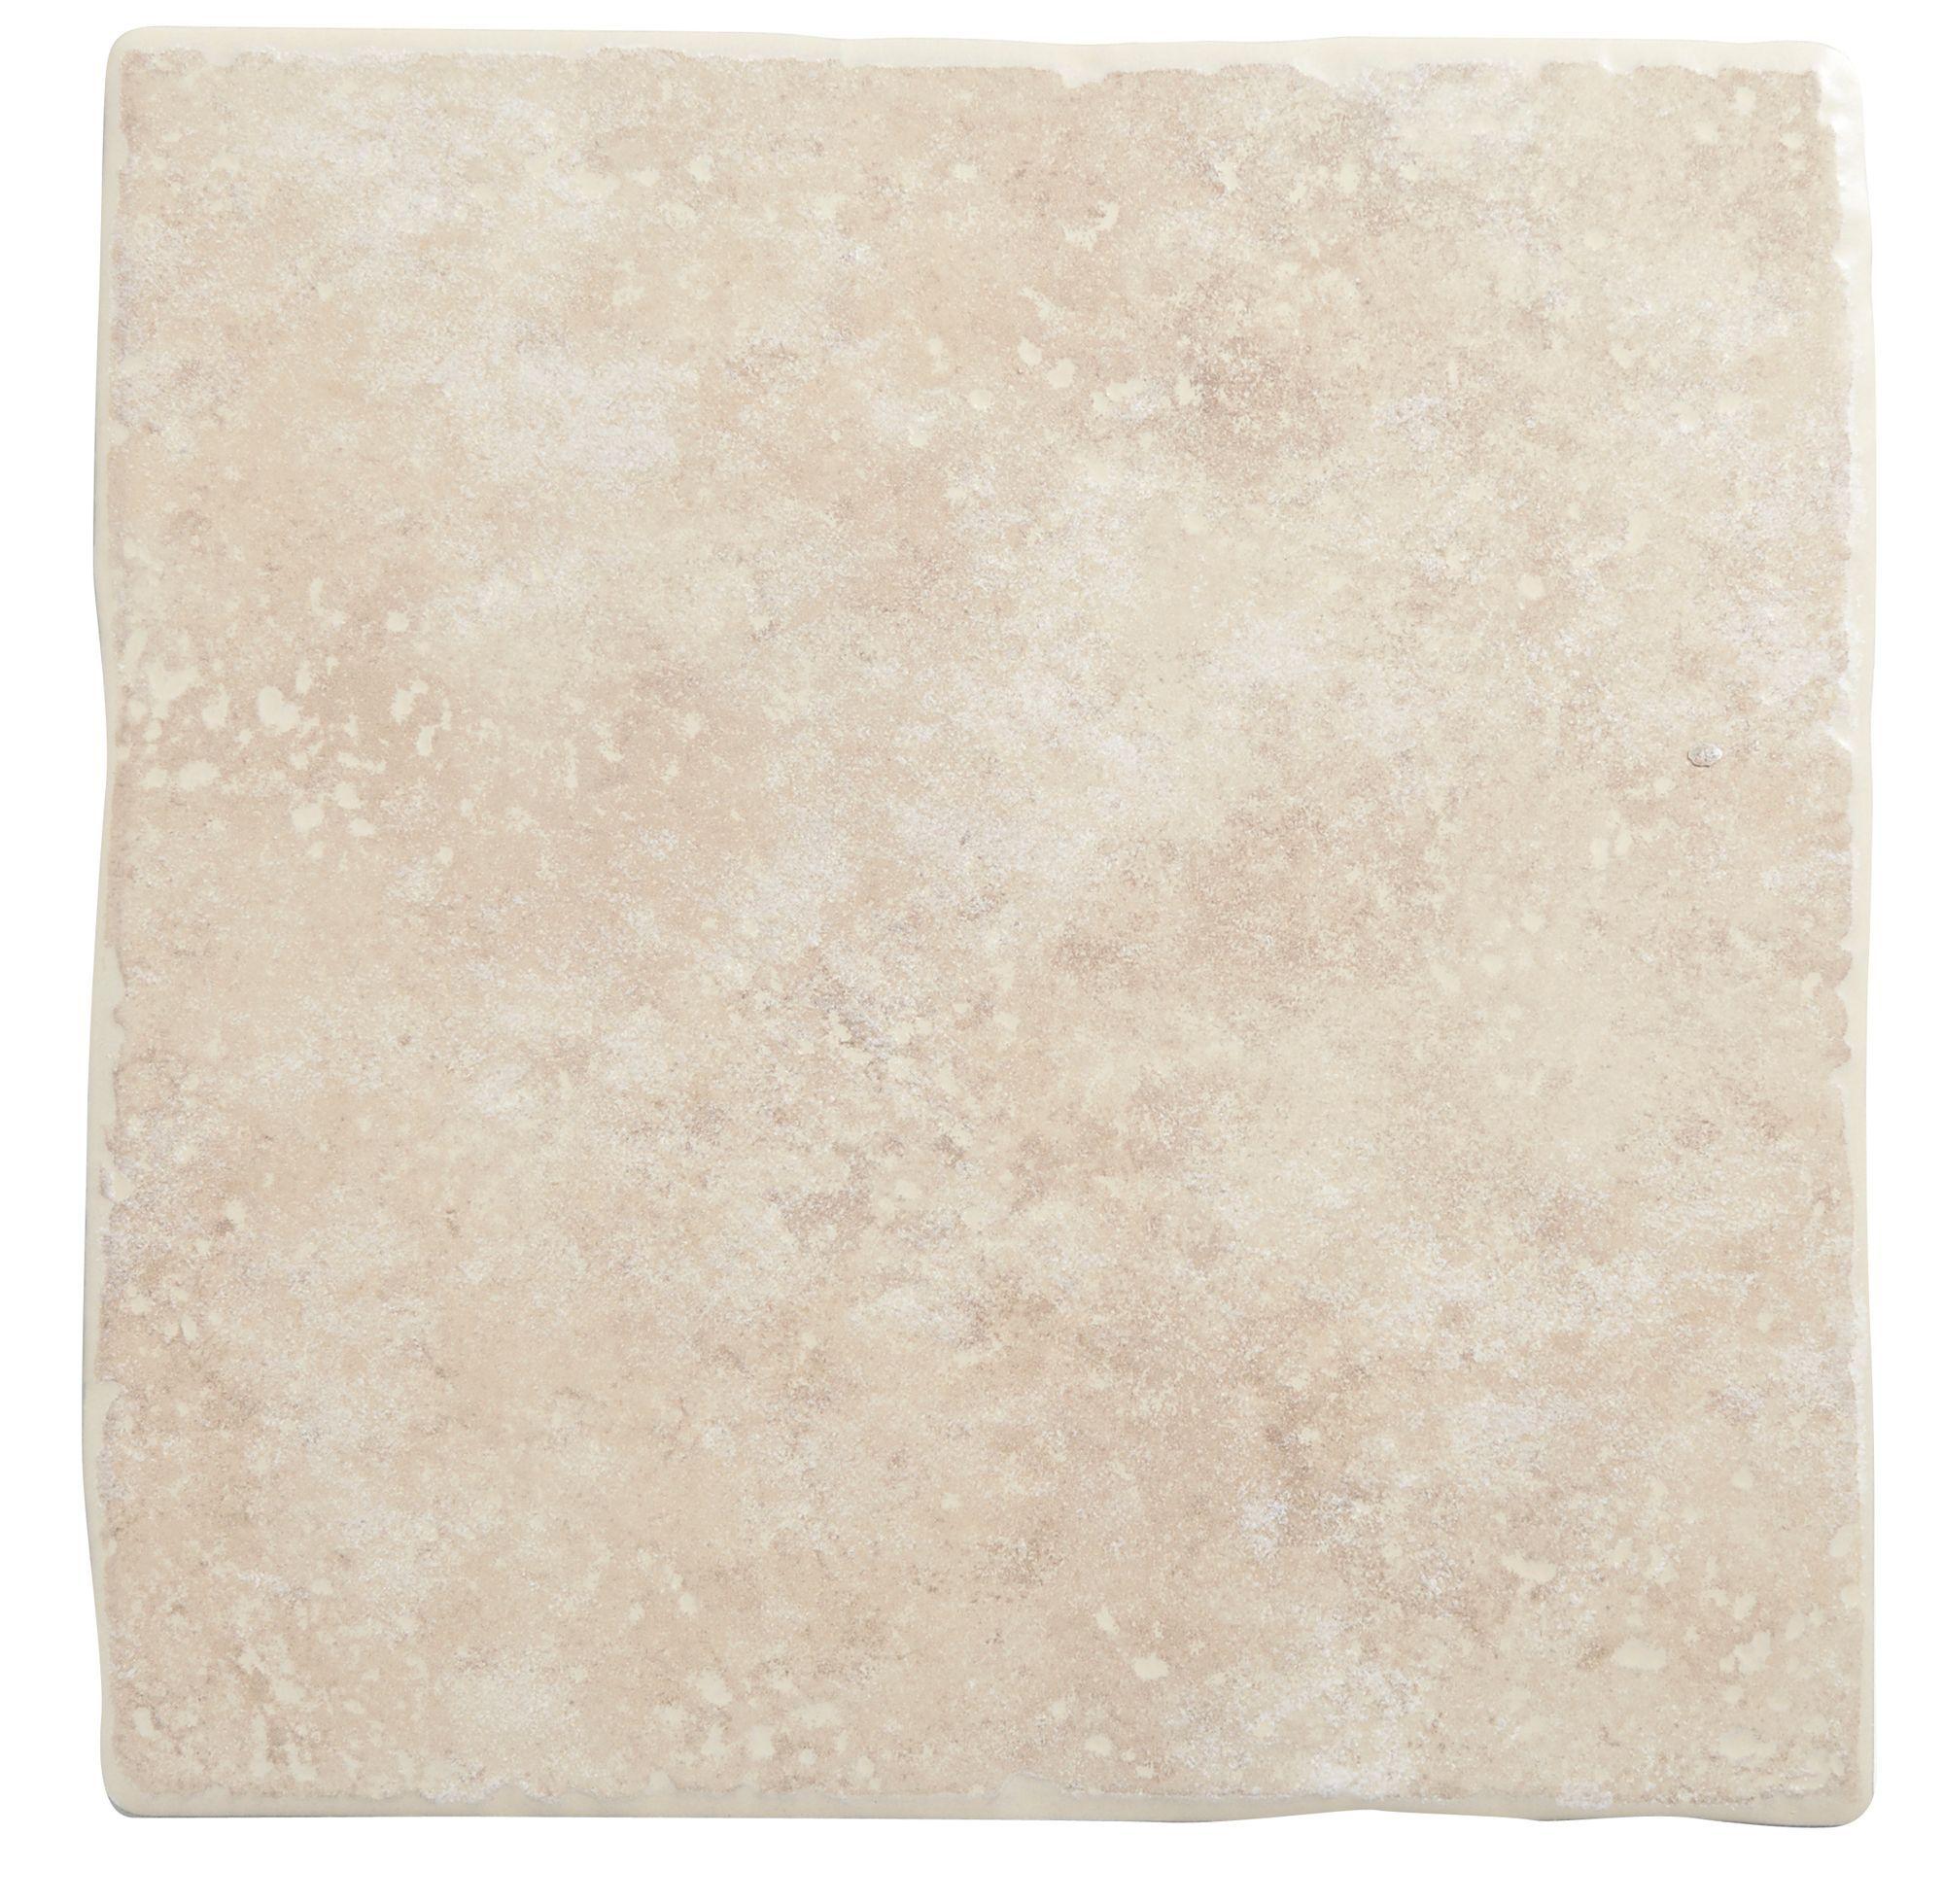 Calcuta natural stone effect ceramic floor tile pack of 9 l calcuta natural ceramic floor tile pack of 9 l330mm w dailygadgetfo Gallery